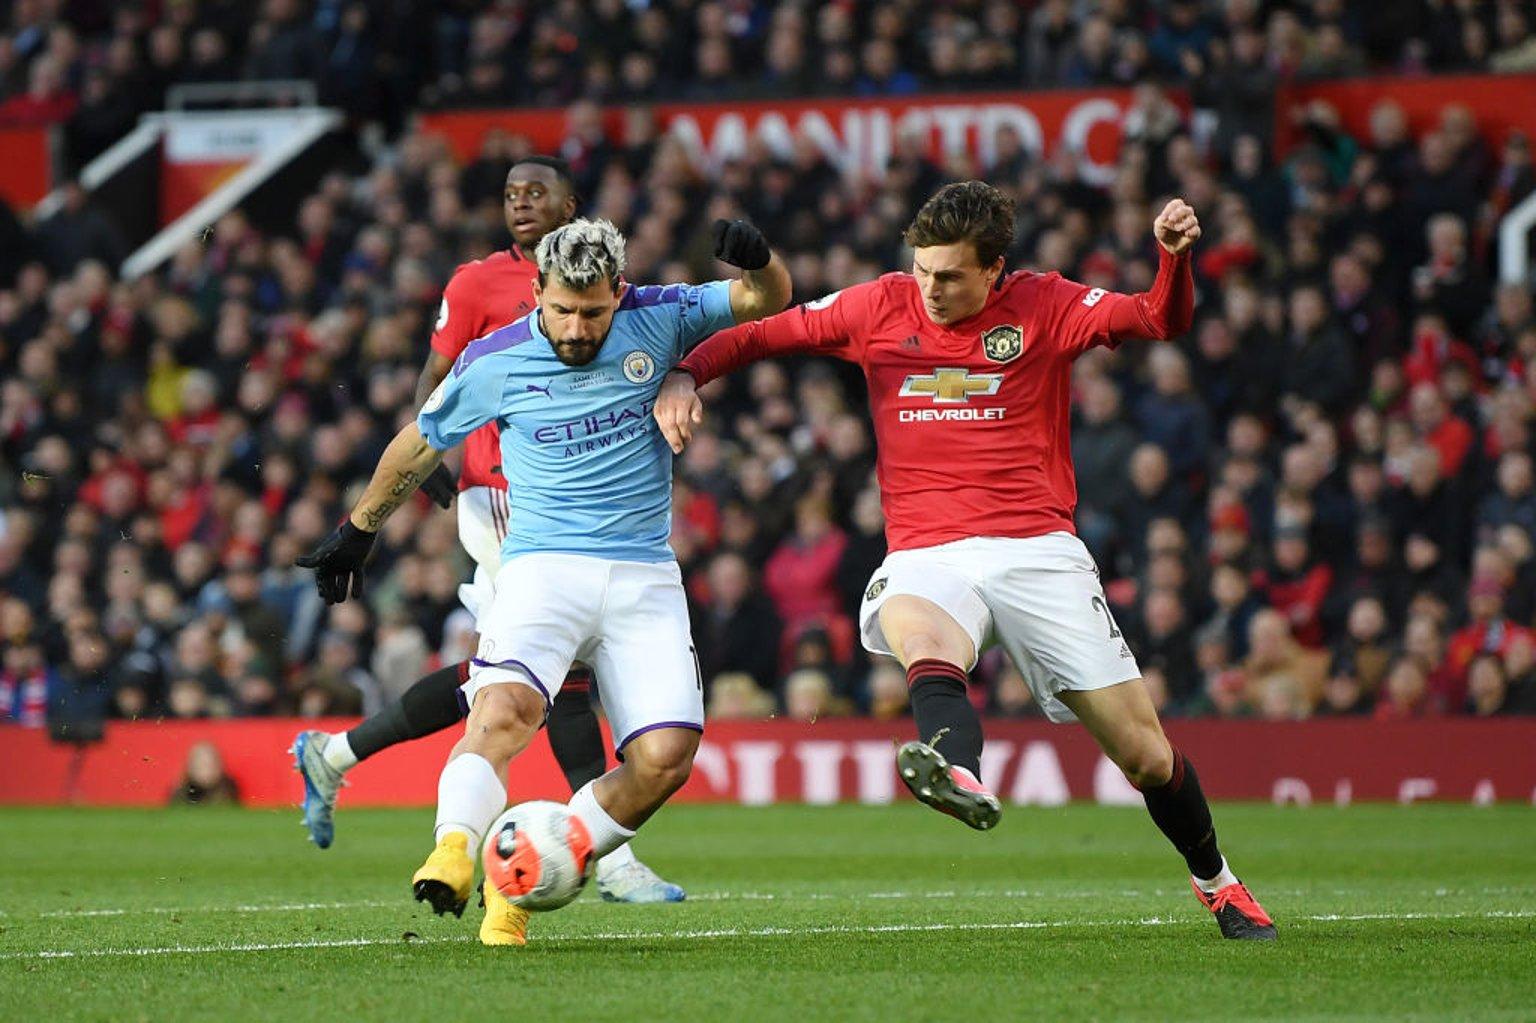 Sergio Aguero has a goal disallowed as City chase an equaliser